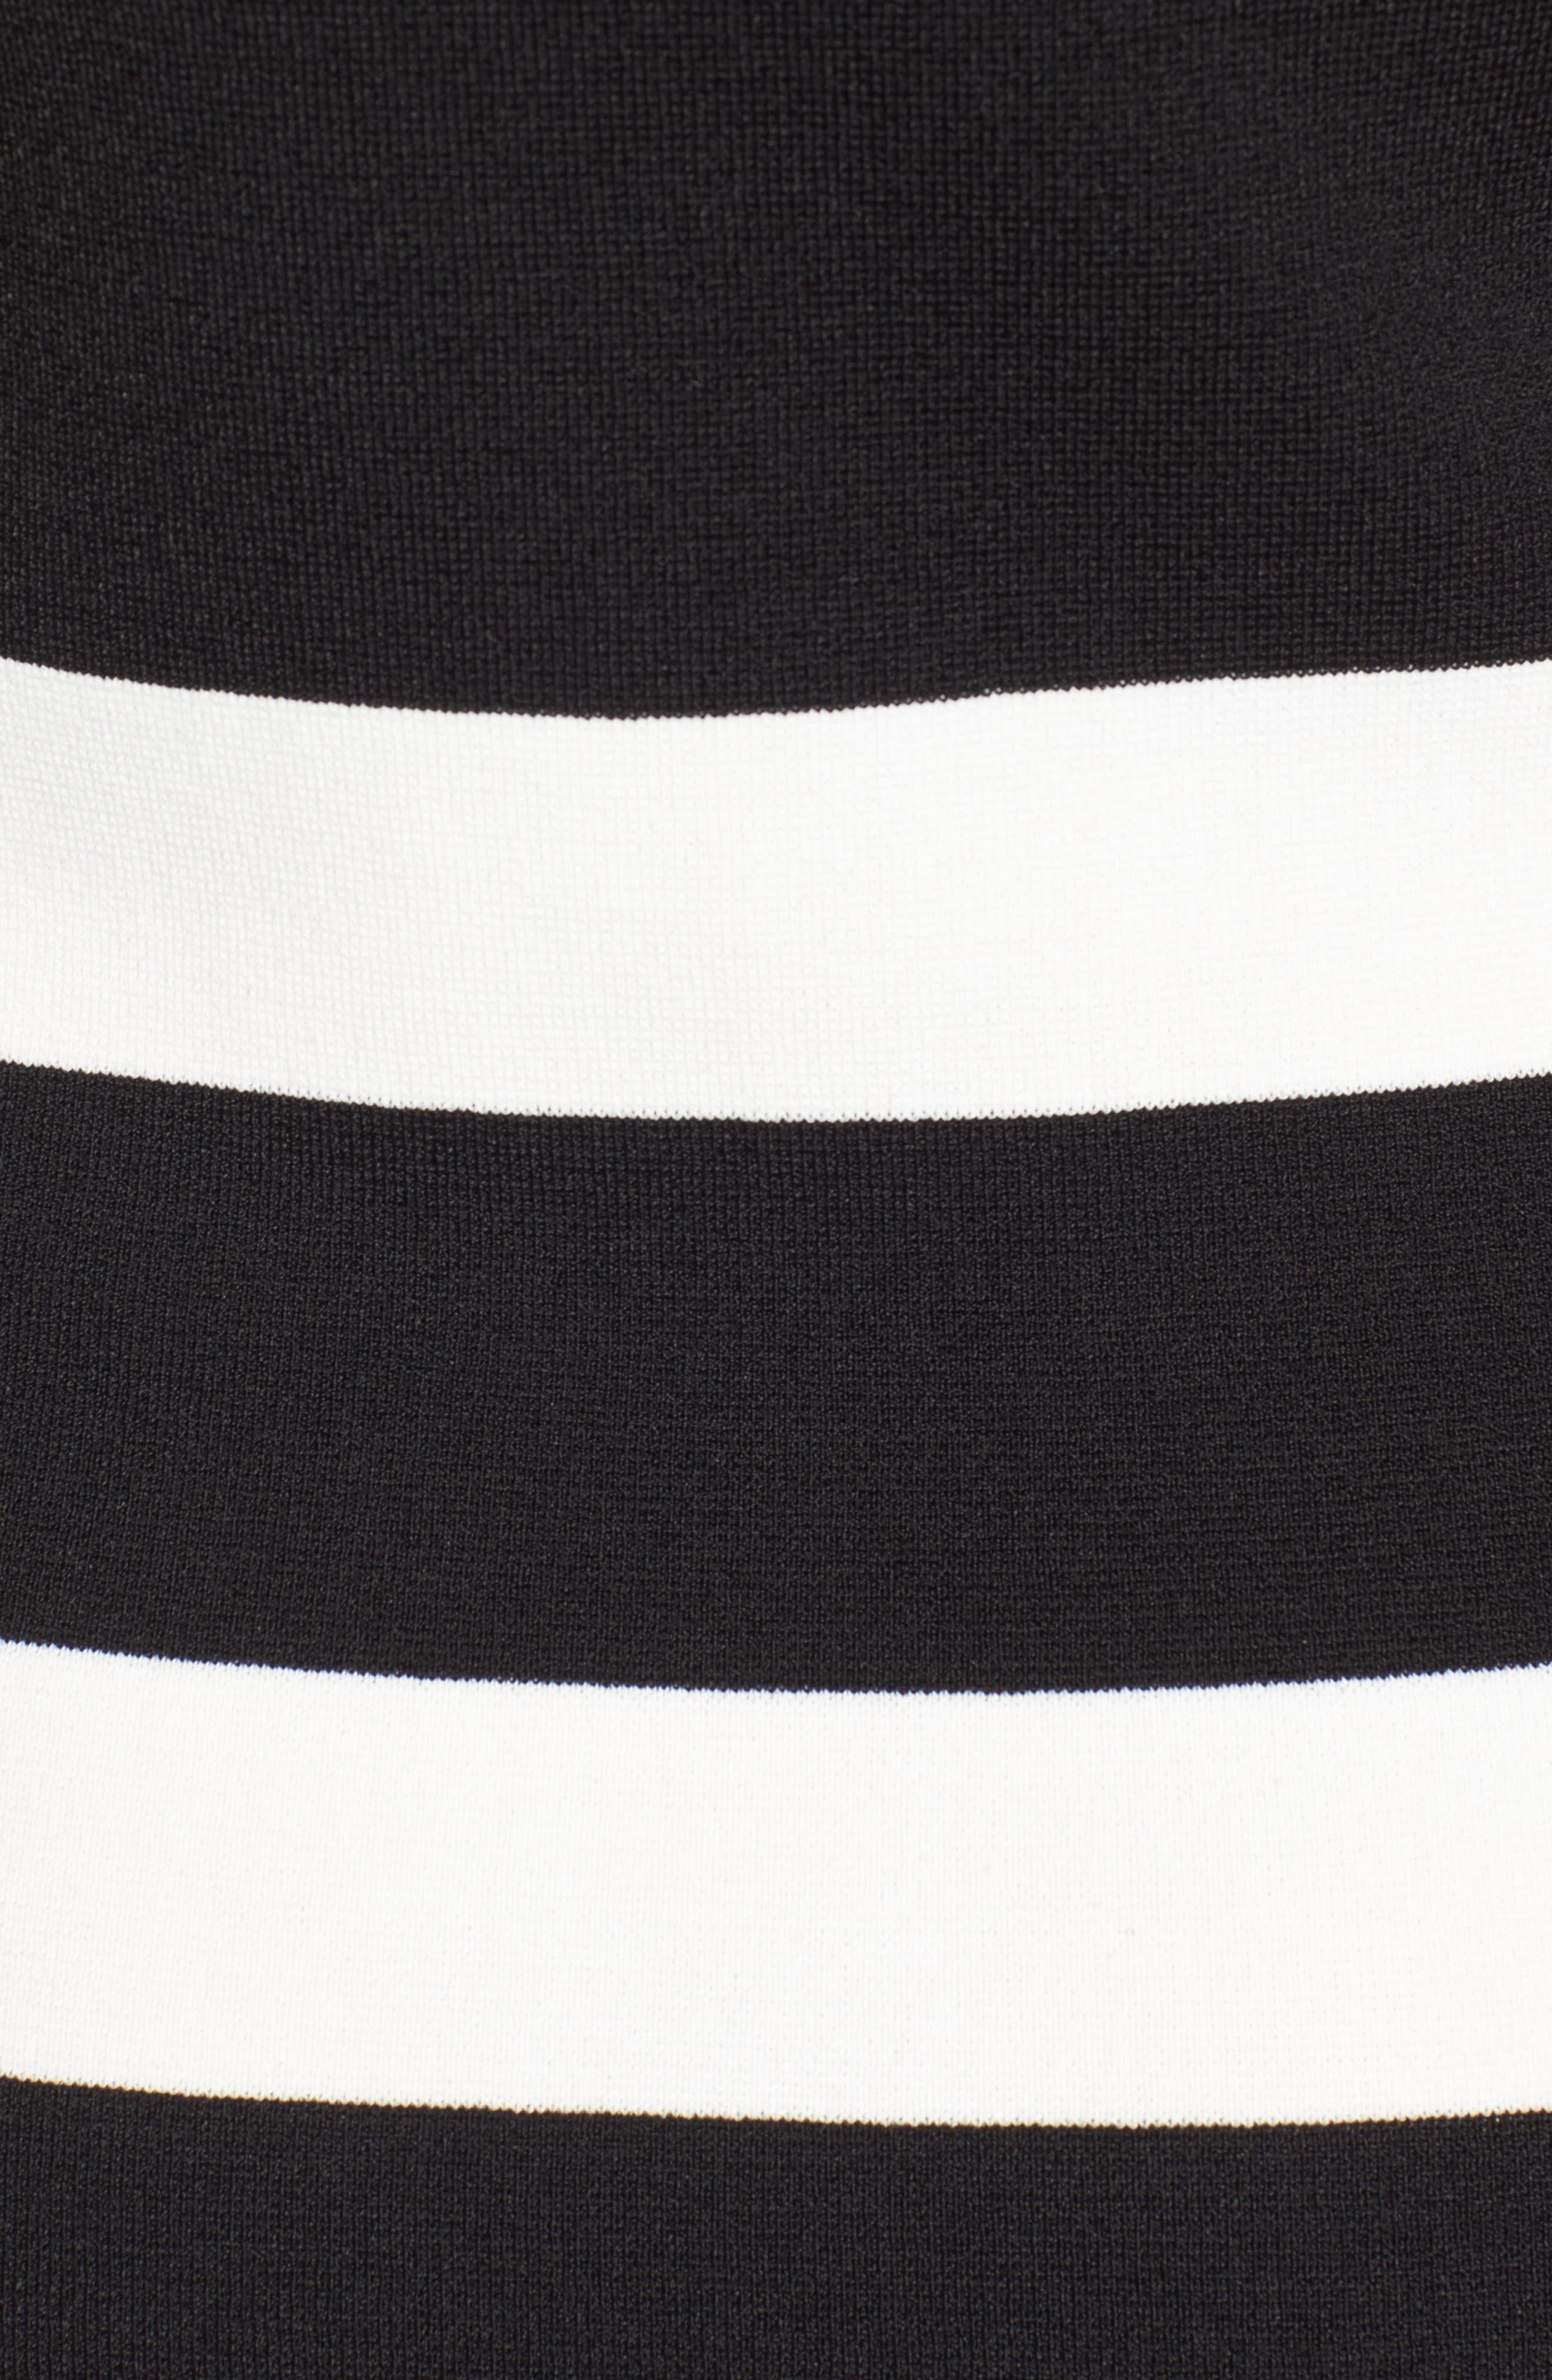 Bow Back Striped Sweater Dress,                             Alternate thumbnail 5, color,                             Black/ White